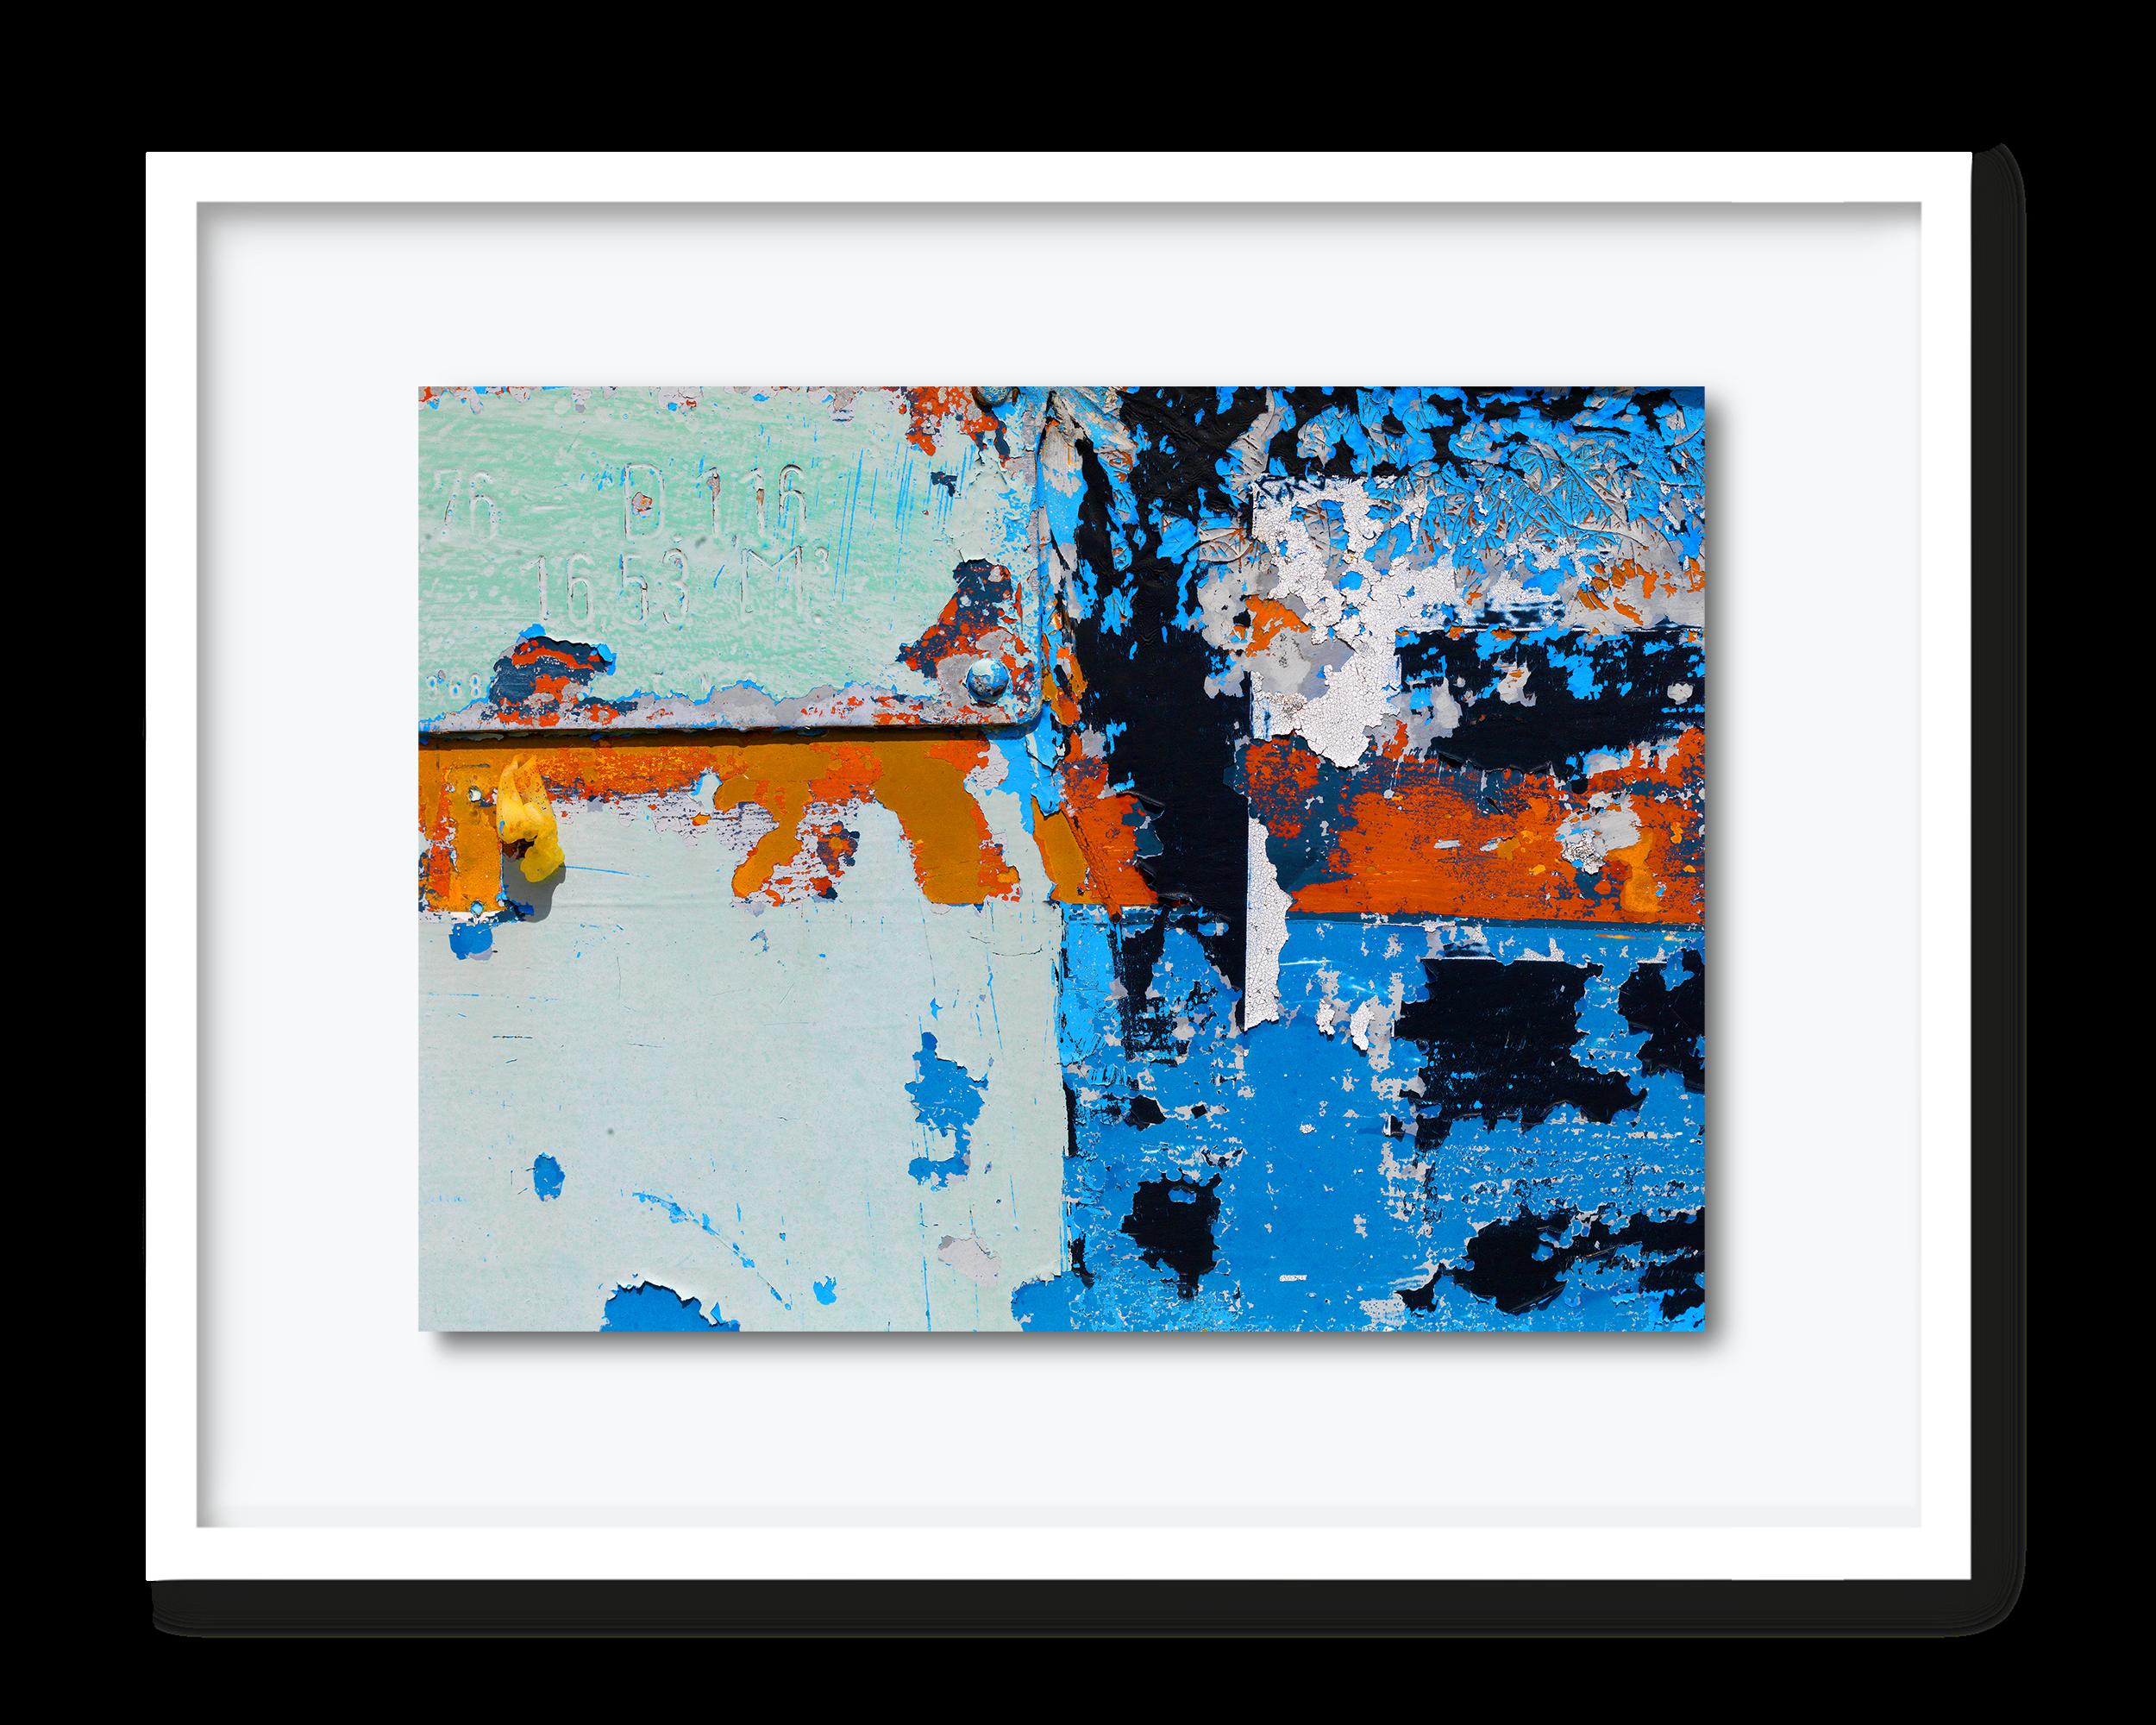 41.david-pearce-peeling-paint3.png